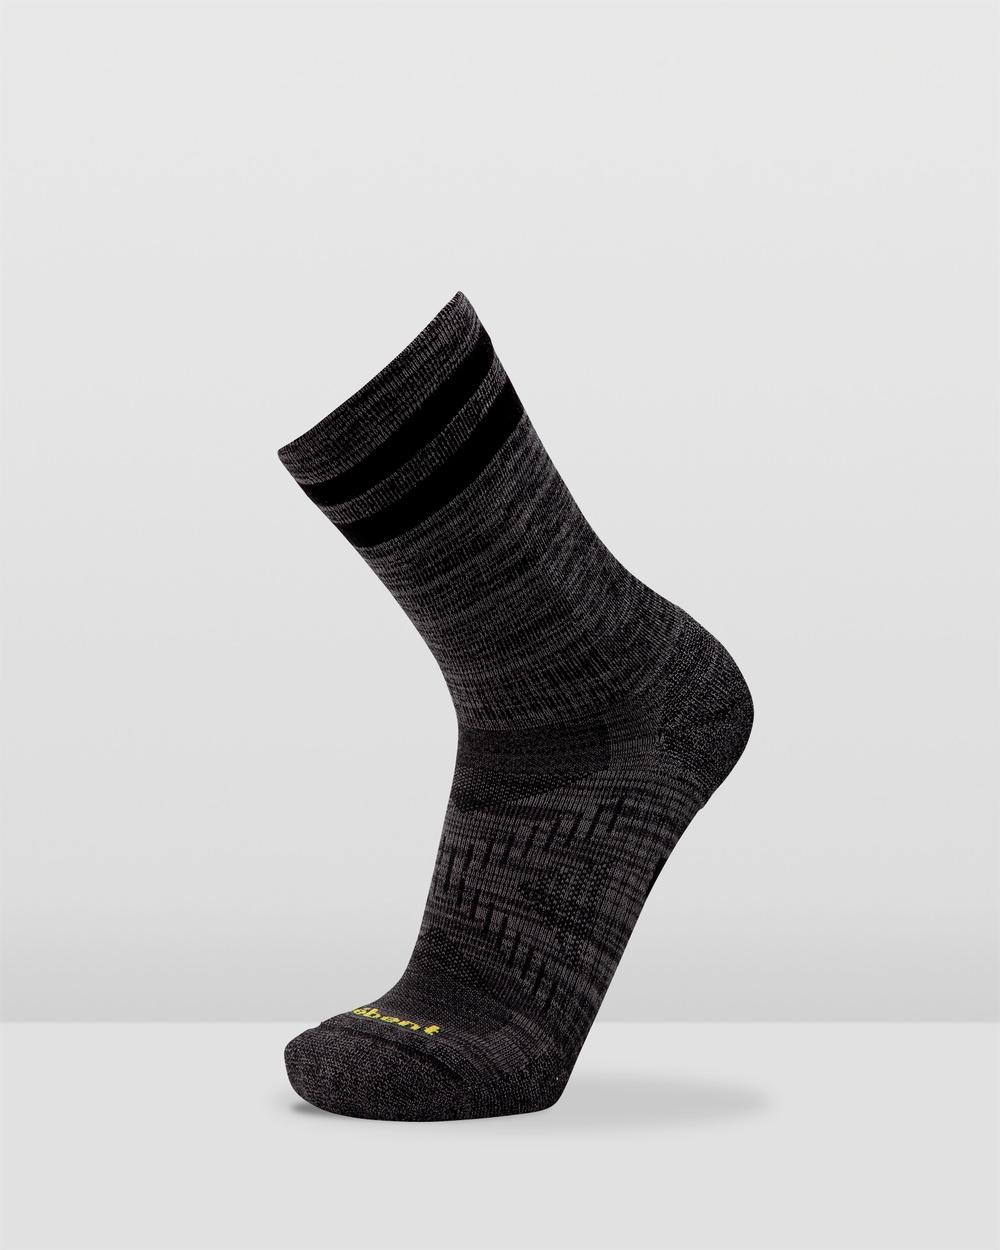 Le Bent Trail Light 3 4 Crew Socks Black Marle 3-4